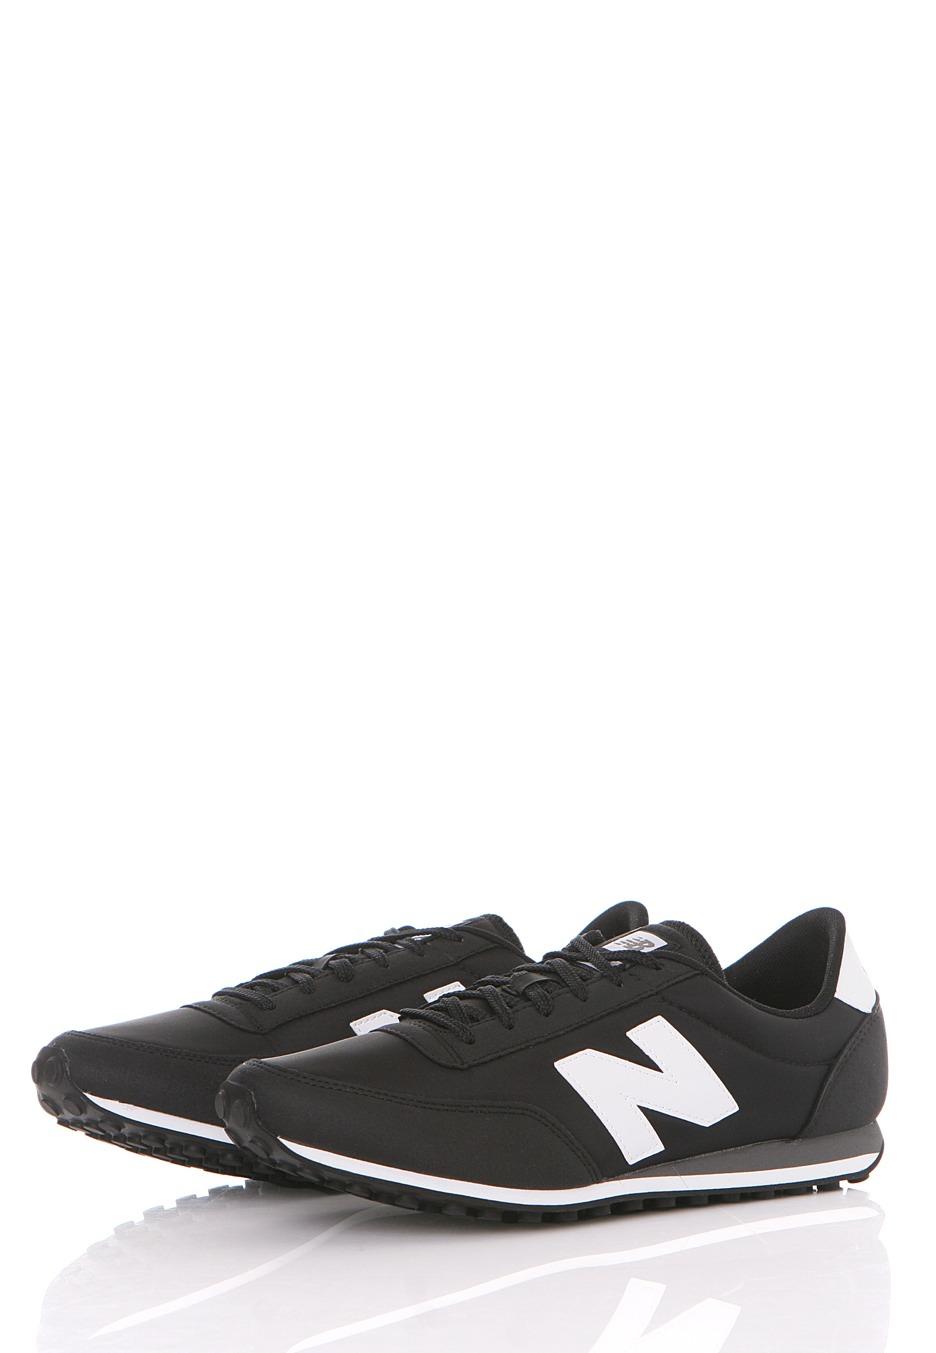 new balance u410 black white shoes official